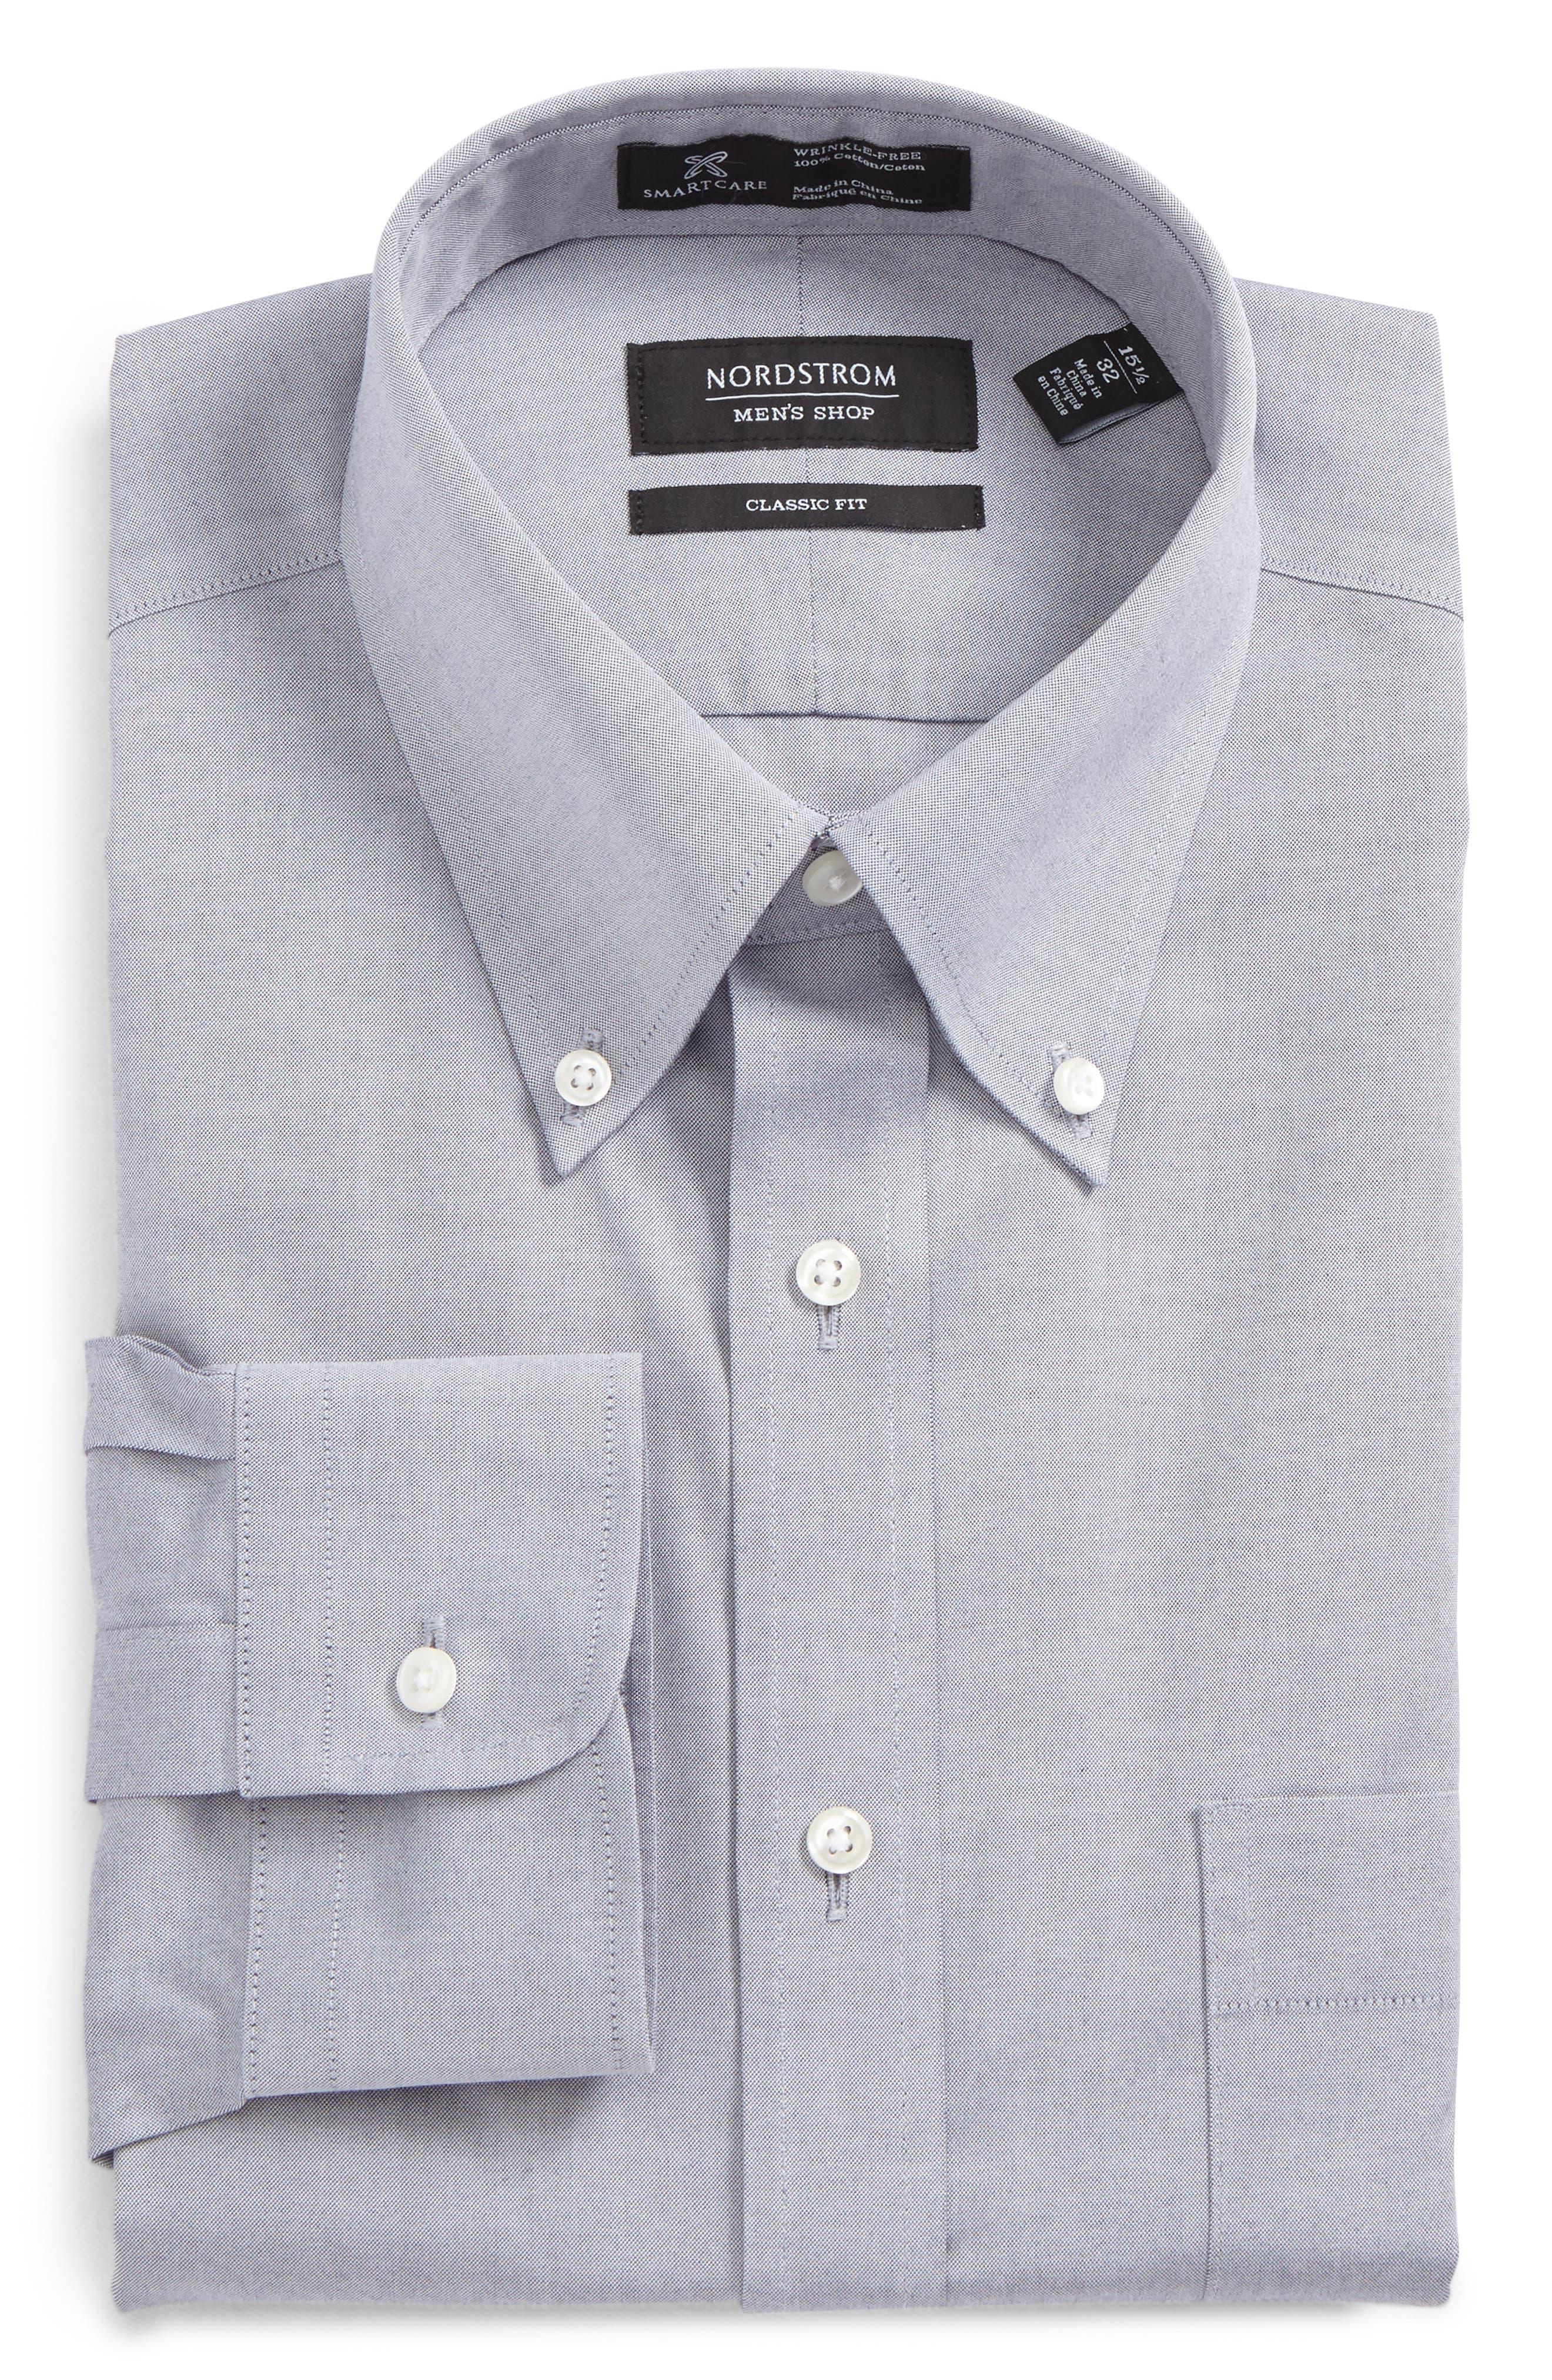 Alternate Image 1 Selected - Nordstrom Men's Shop Smartcare™ Classic Fit Pinpoint Dress Shirt (Online Only)